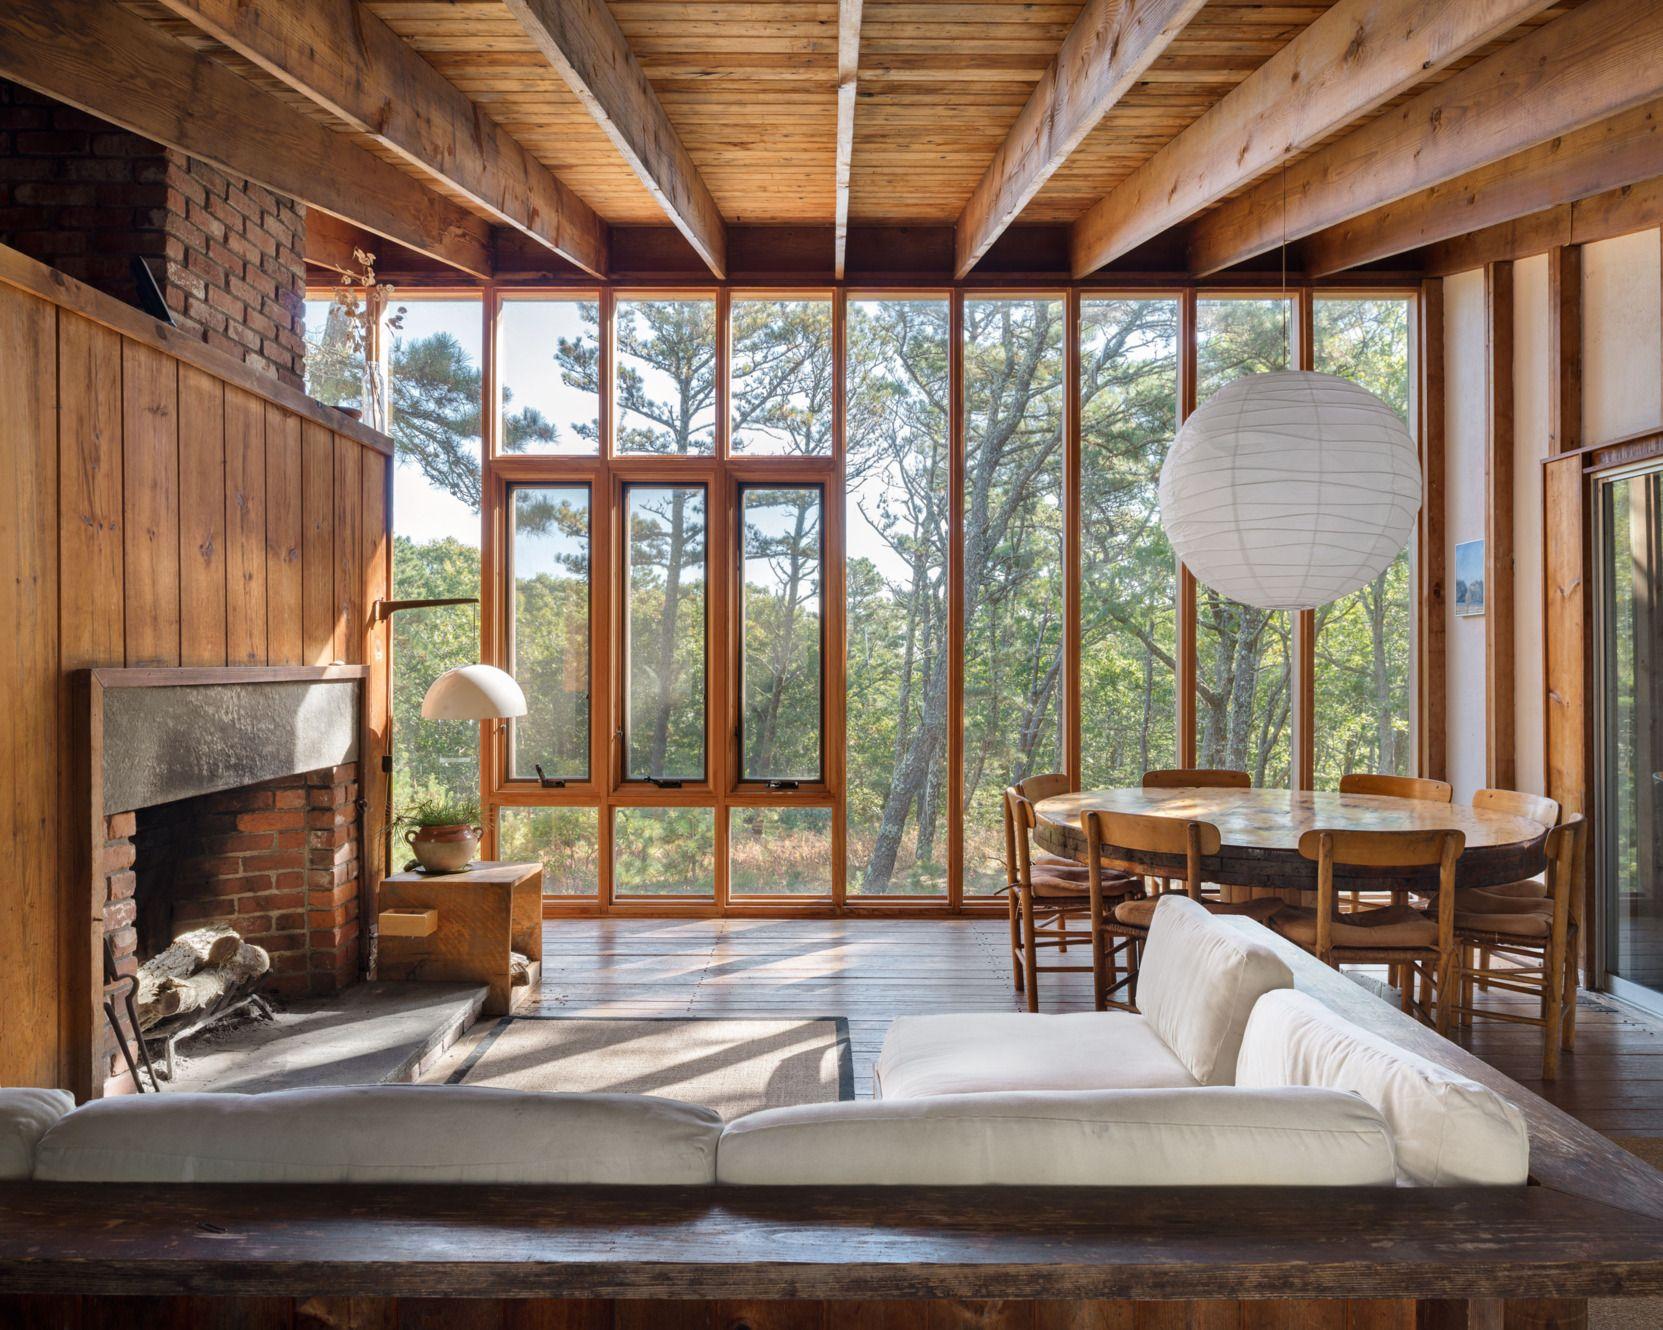 Halprin House, 1965. Cape CodCapesWoodsWindowsGoogle SearchModern HomesContemporary  HomesInterior DesignInterior Styling